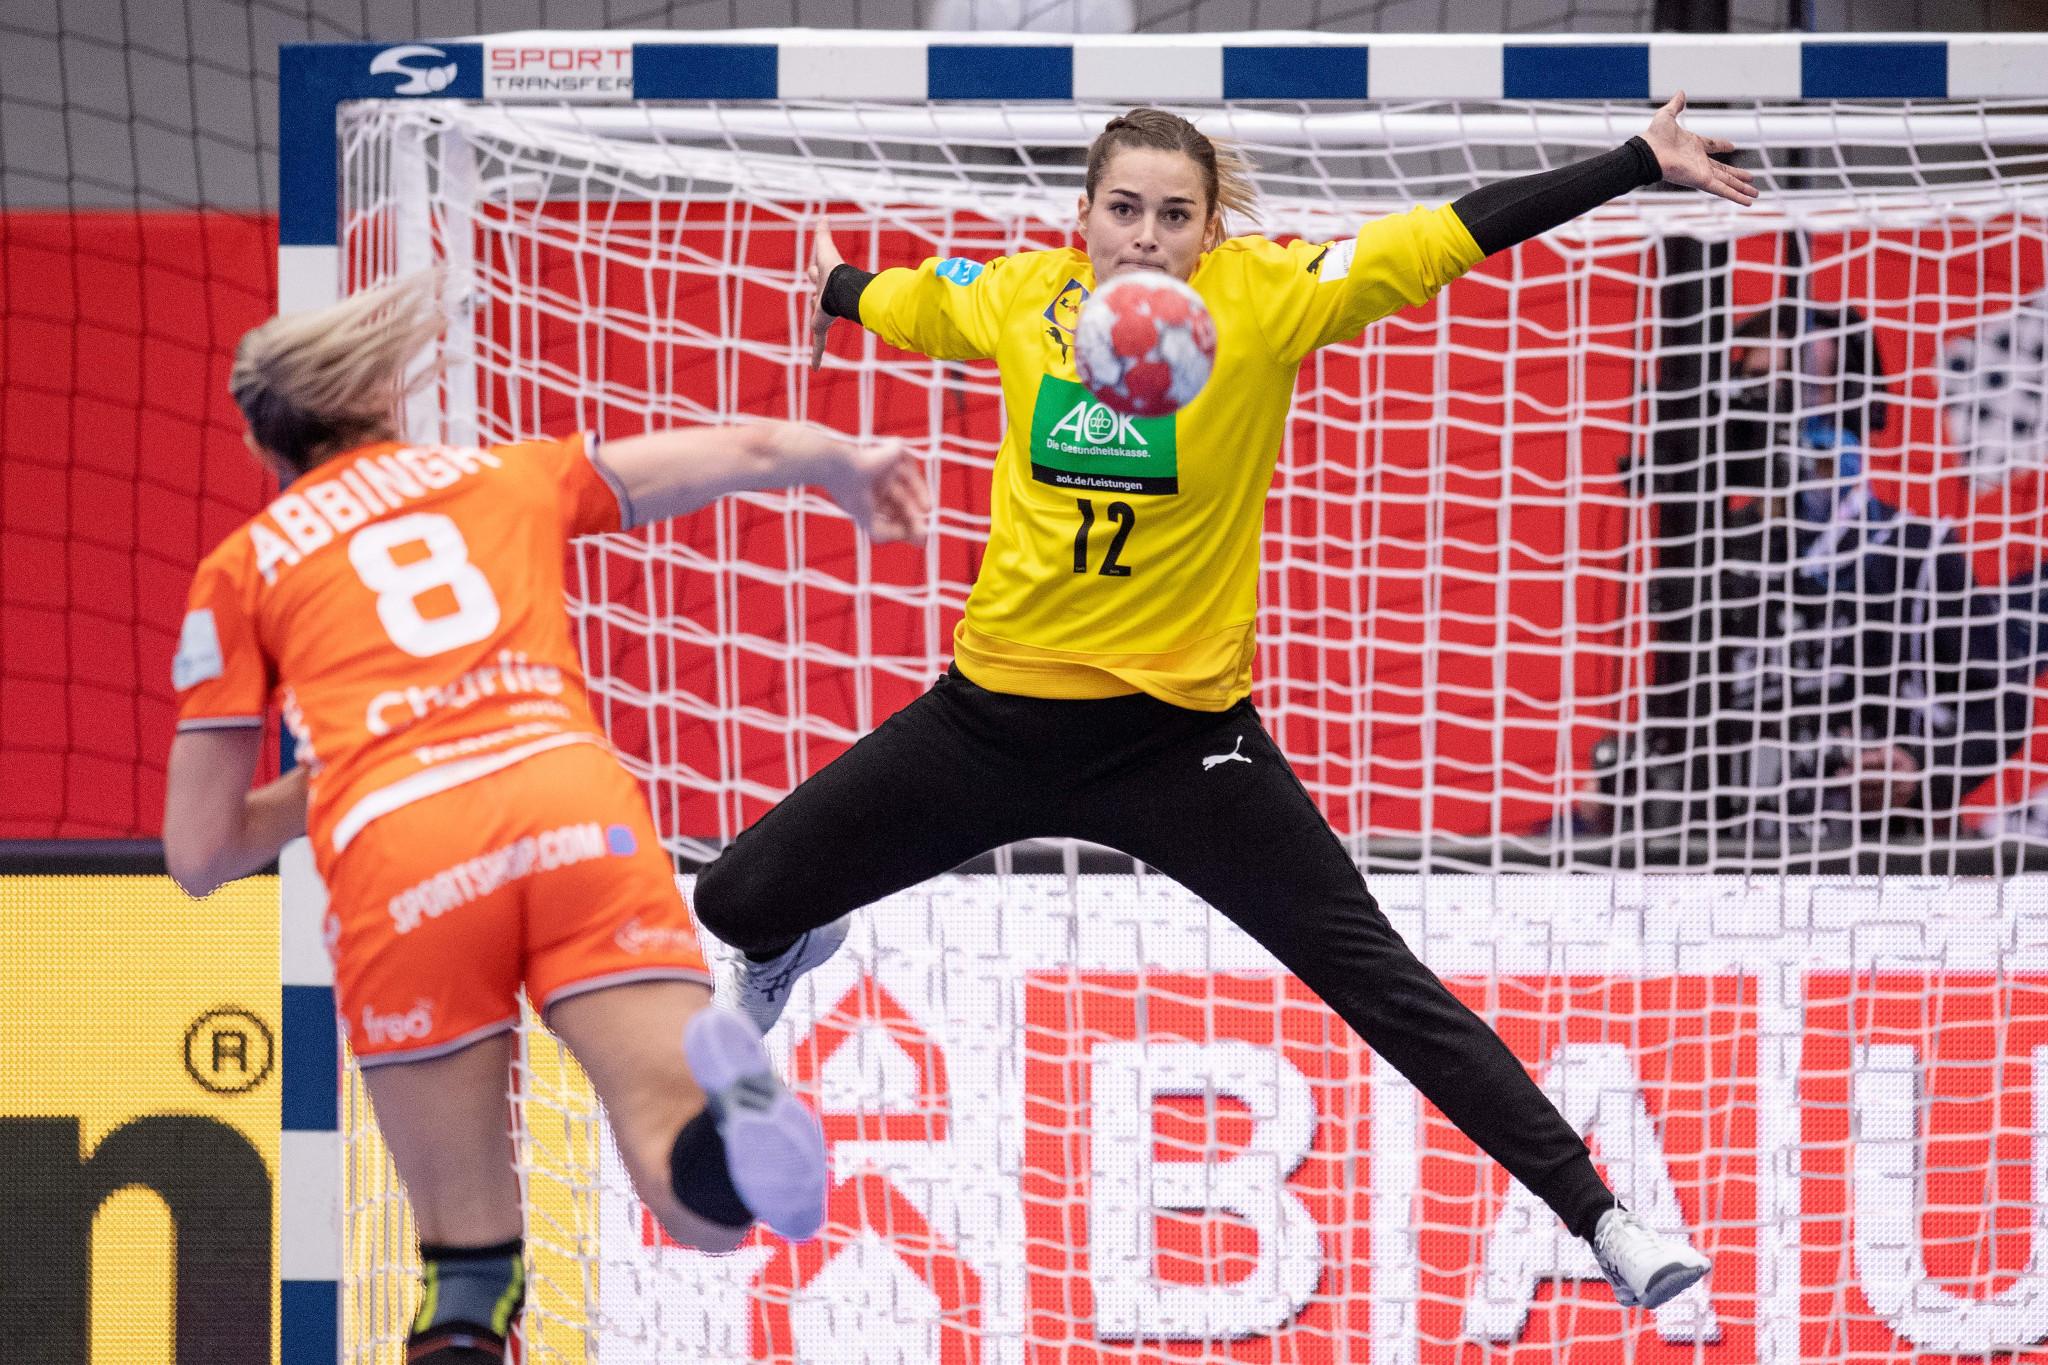 Dutch world champions out of semi-final contention at European Women's Handball Championship